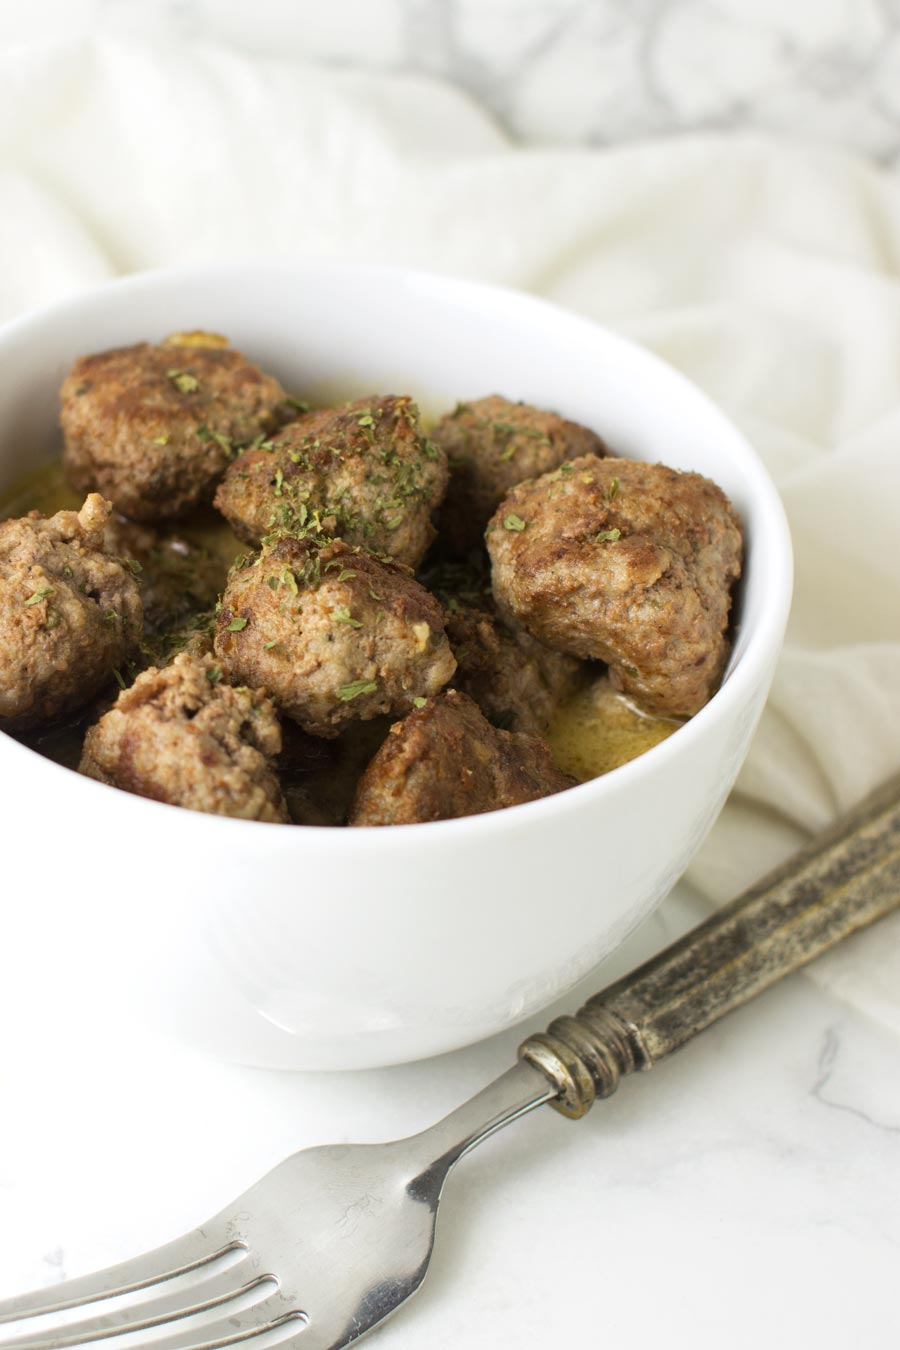 Lamb Meatballs with Mushroom Sauce recipe from acleanplate.com #paleo #aip #glutenfree